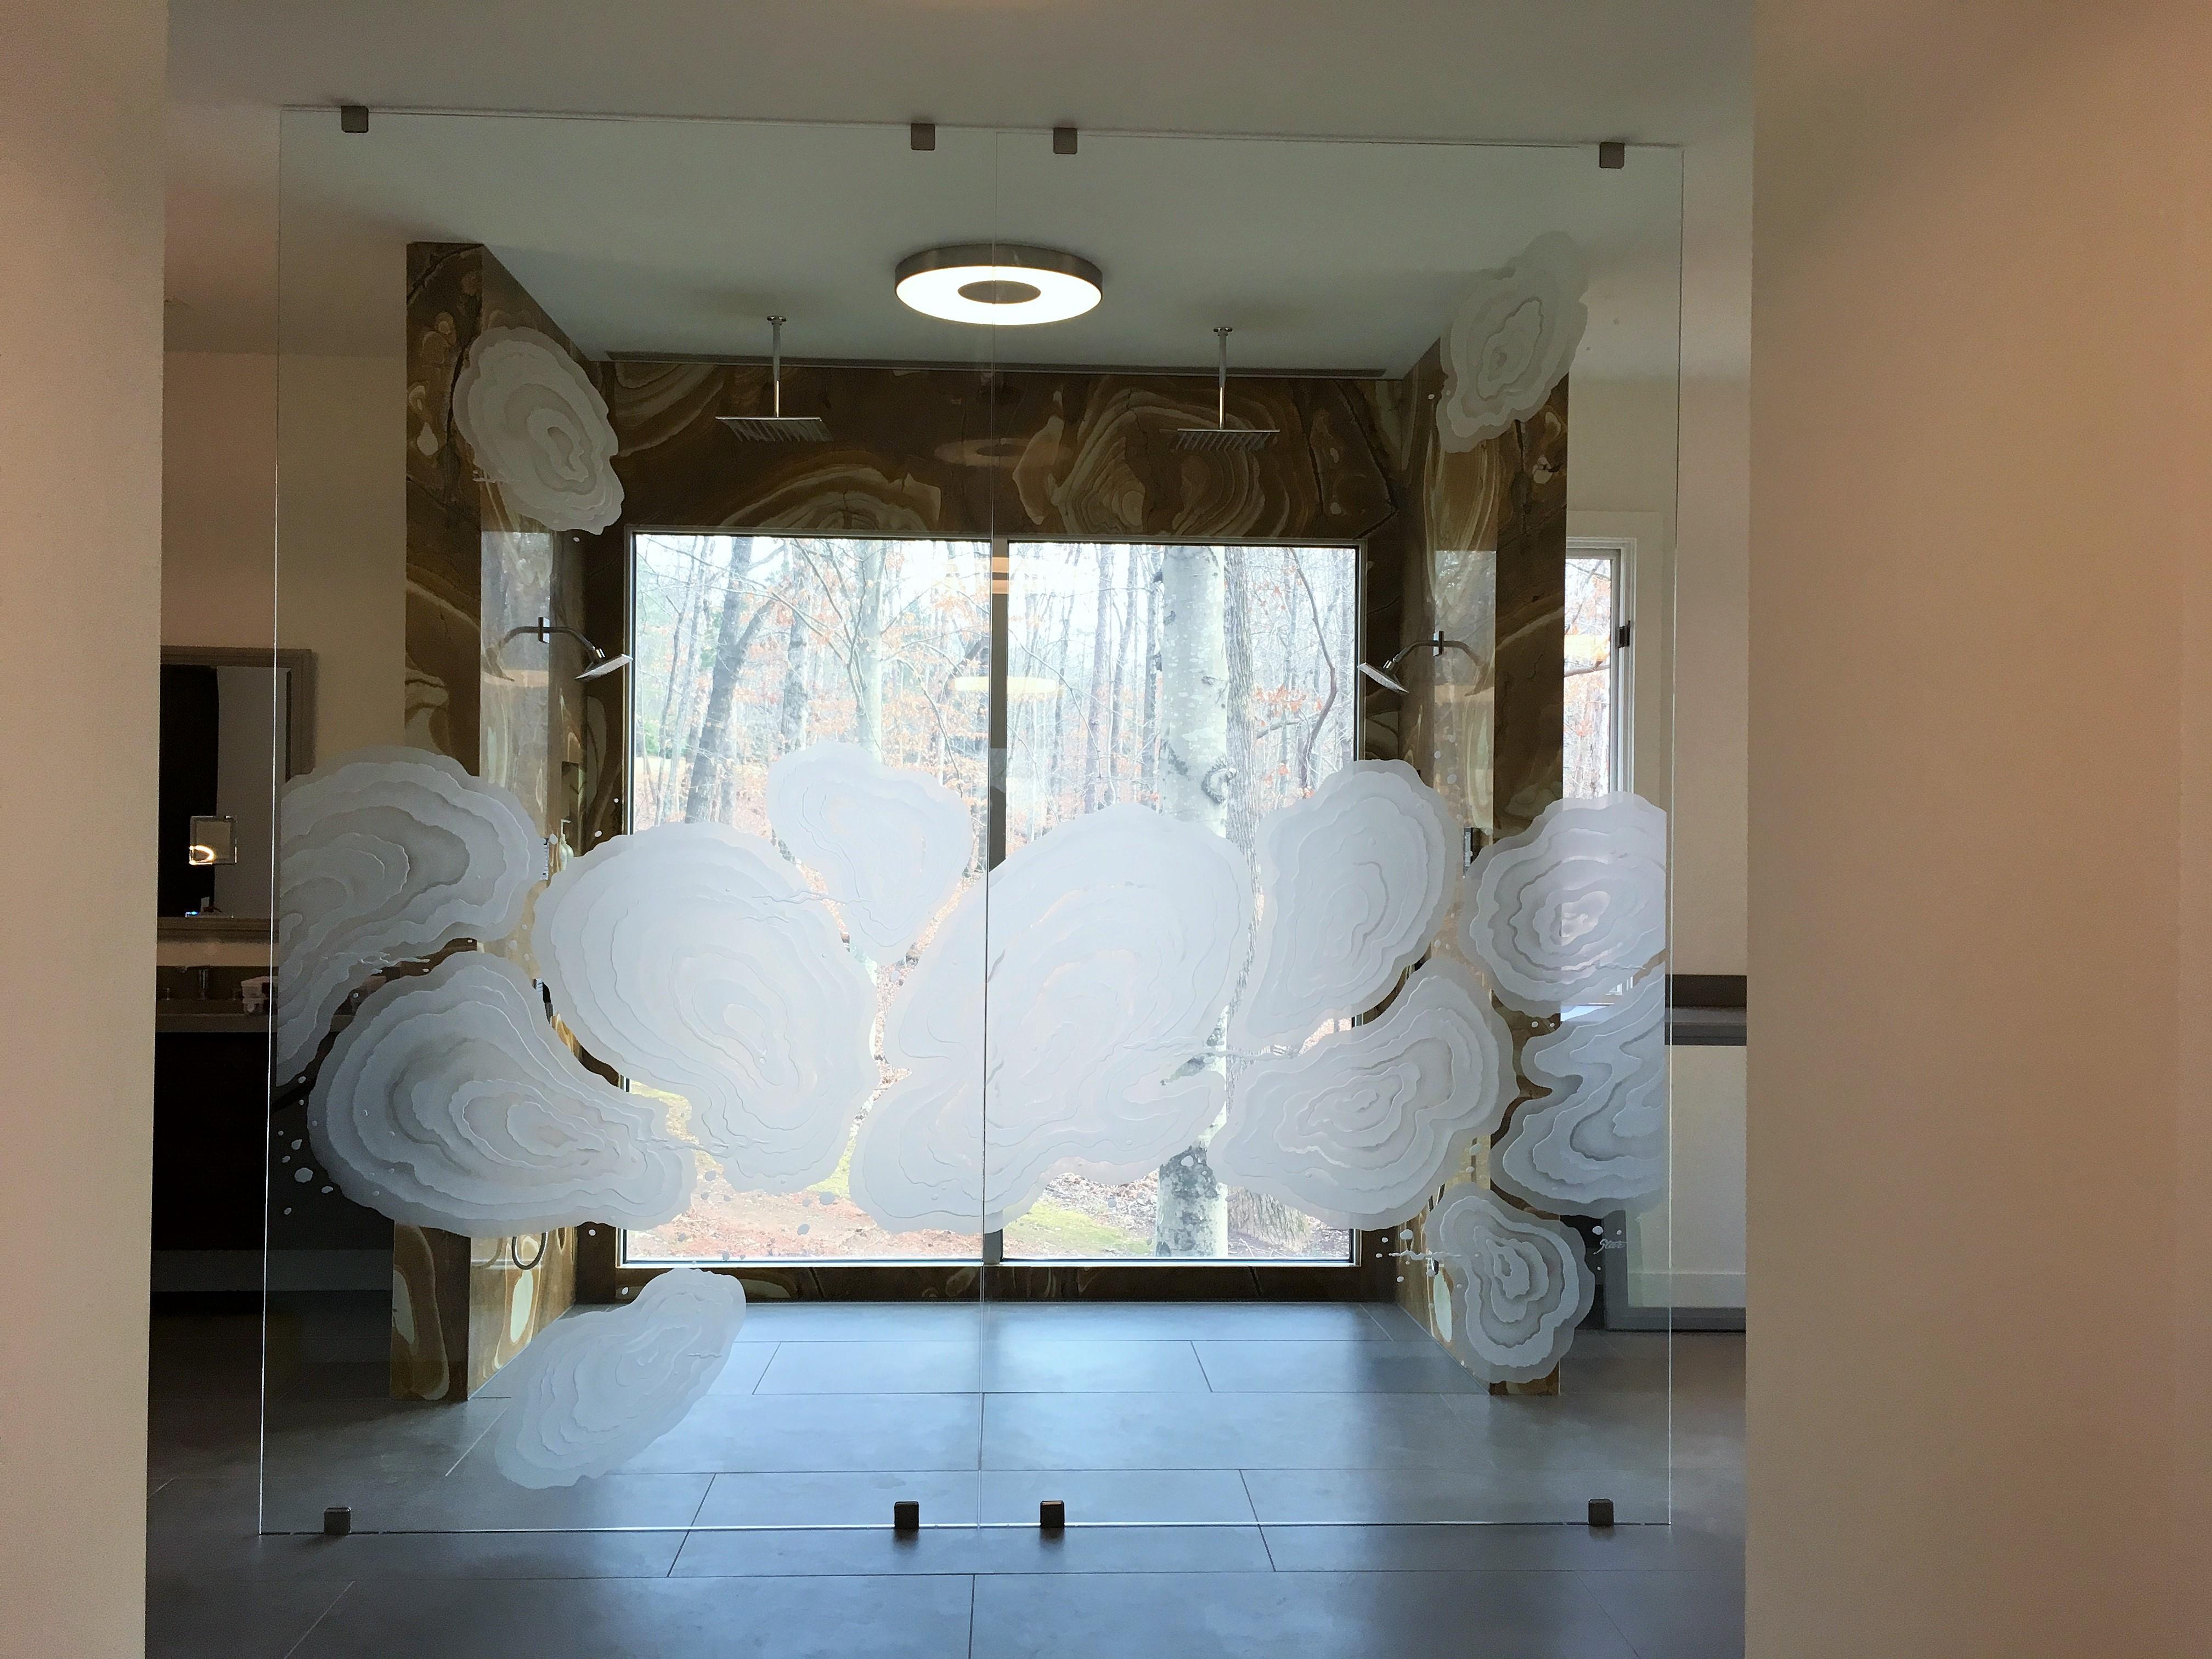 Luxury Bathroom Remodel Complete Wilsoncovingtonconstruction